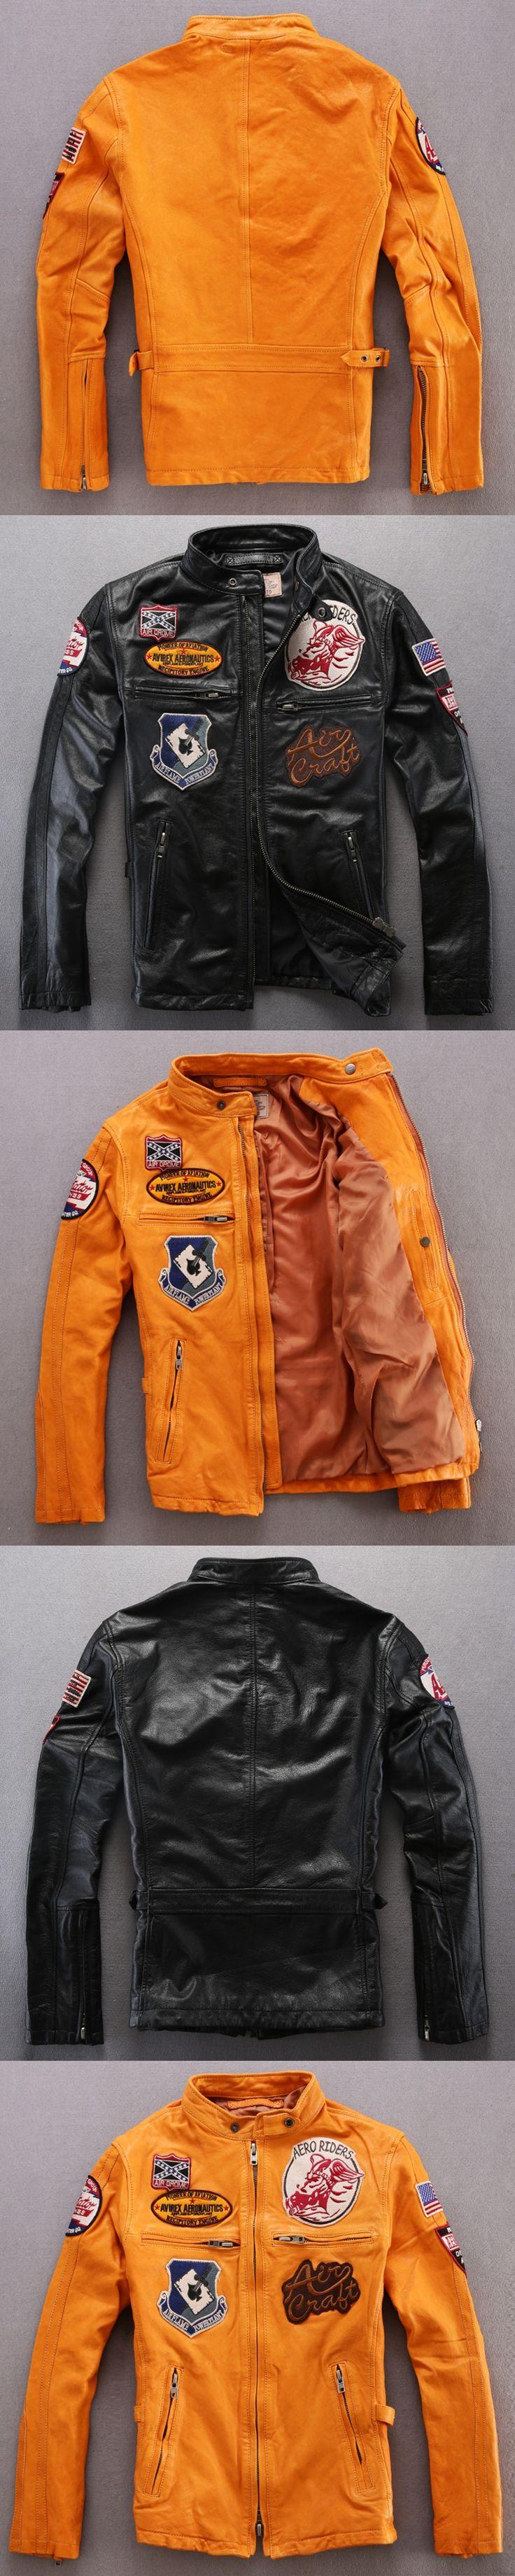 male leather jacket men's 100% Goatskin genuine leather jackets yellow/black slim fit motorcycle leather jacket men pilot jacket